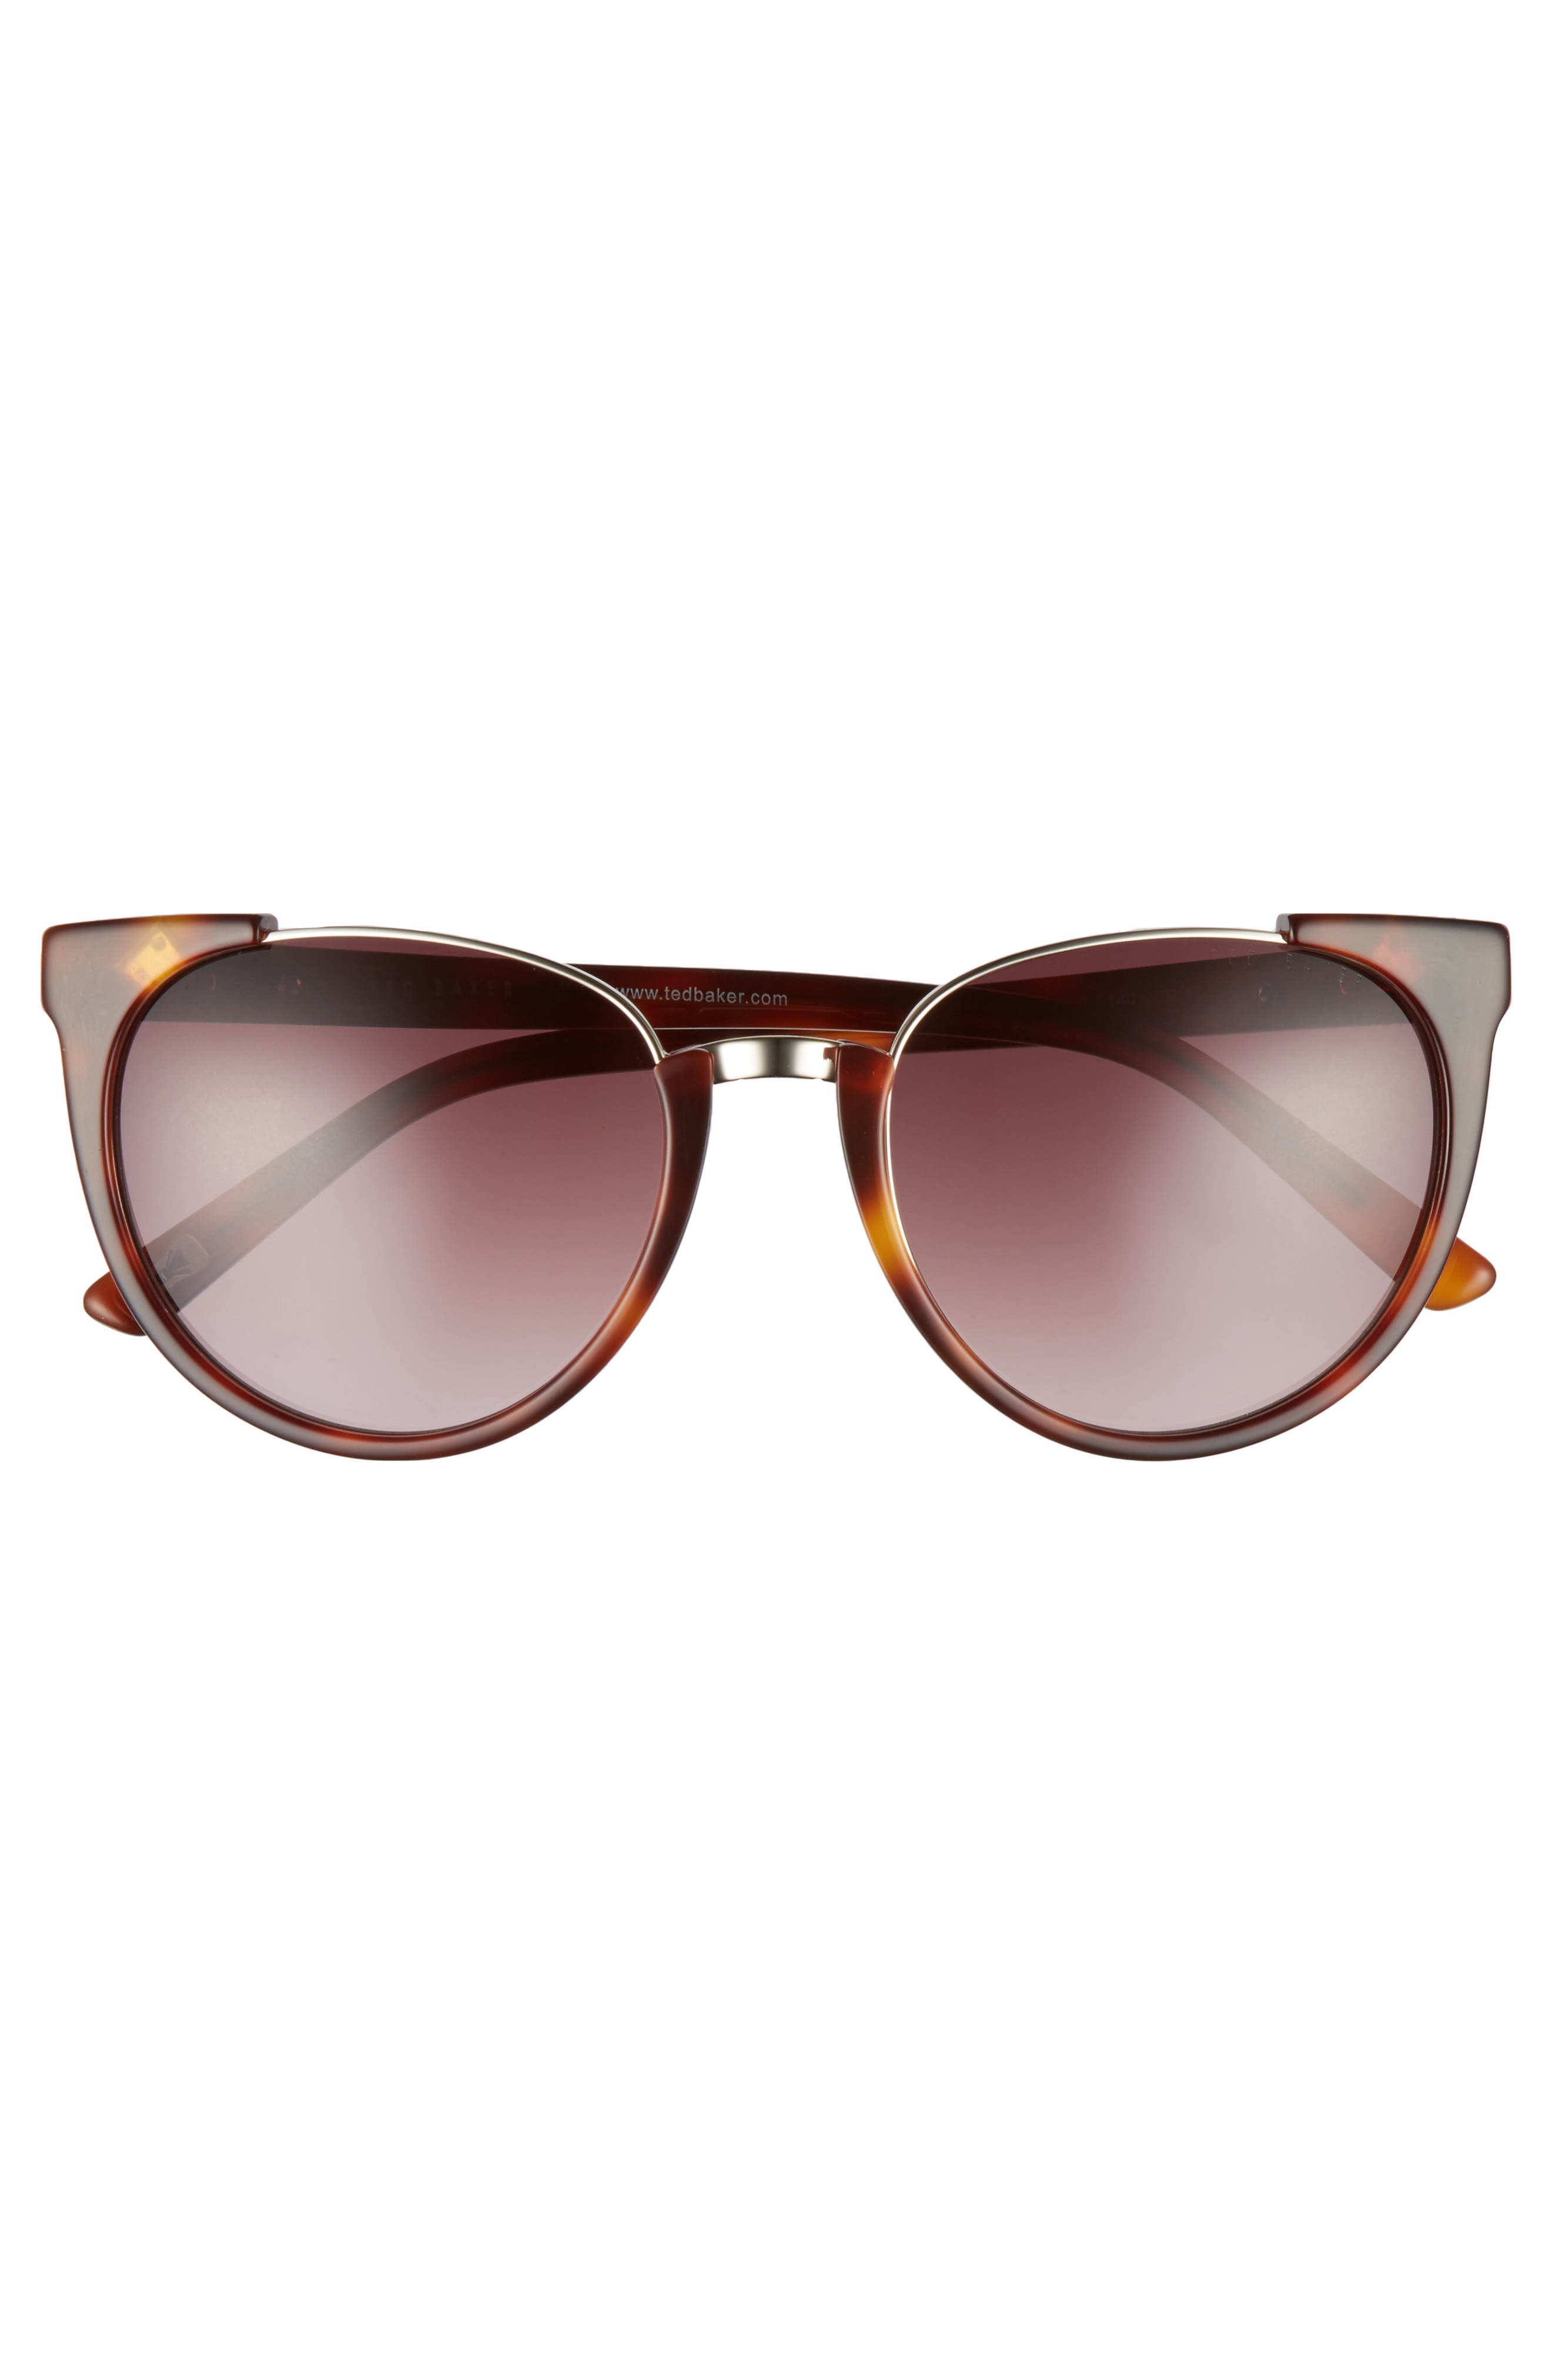 53mm Modified Oval Sunglasses,                             Alternate thumbnail 3, color,                             TORTOISE